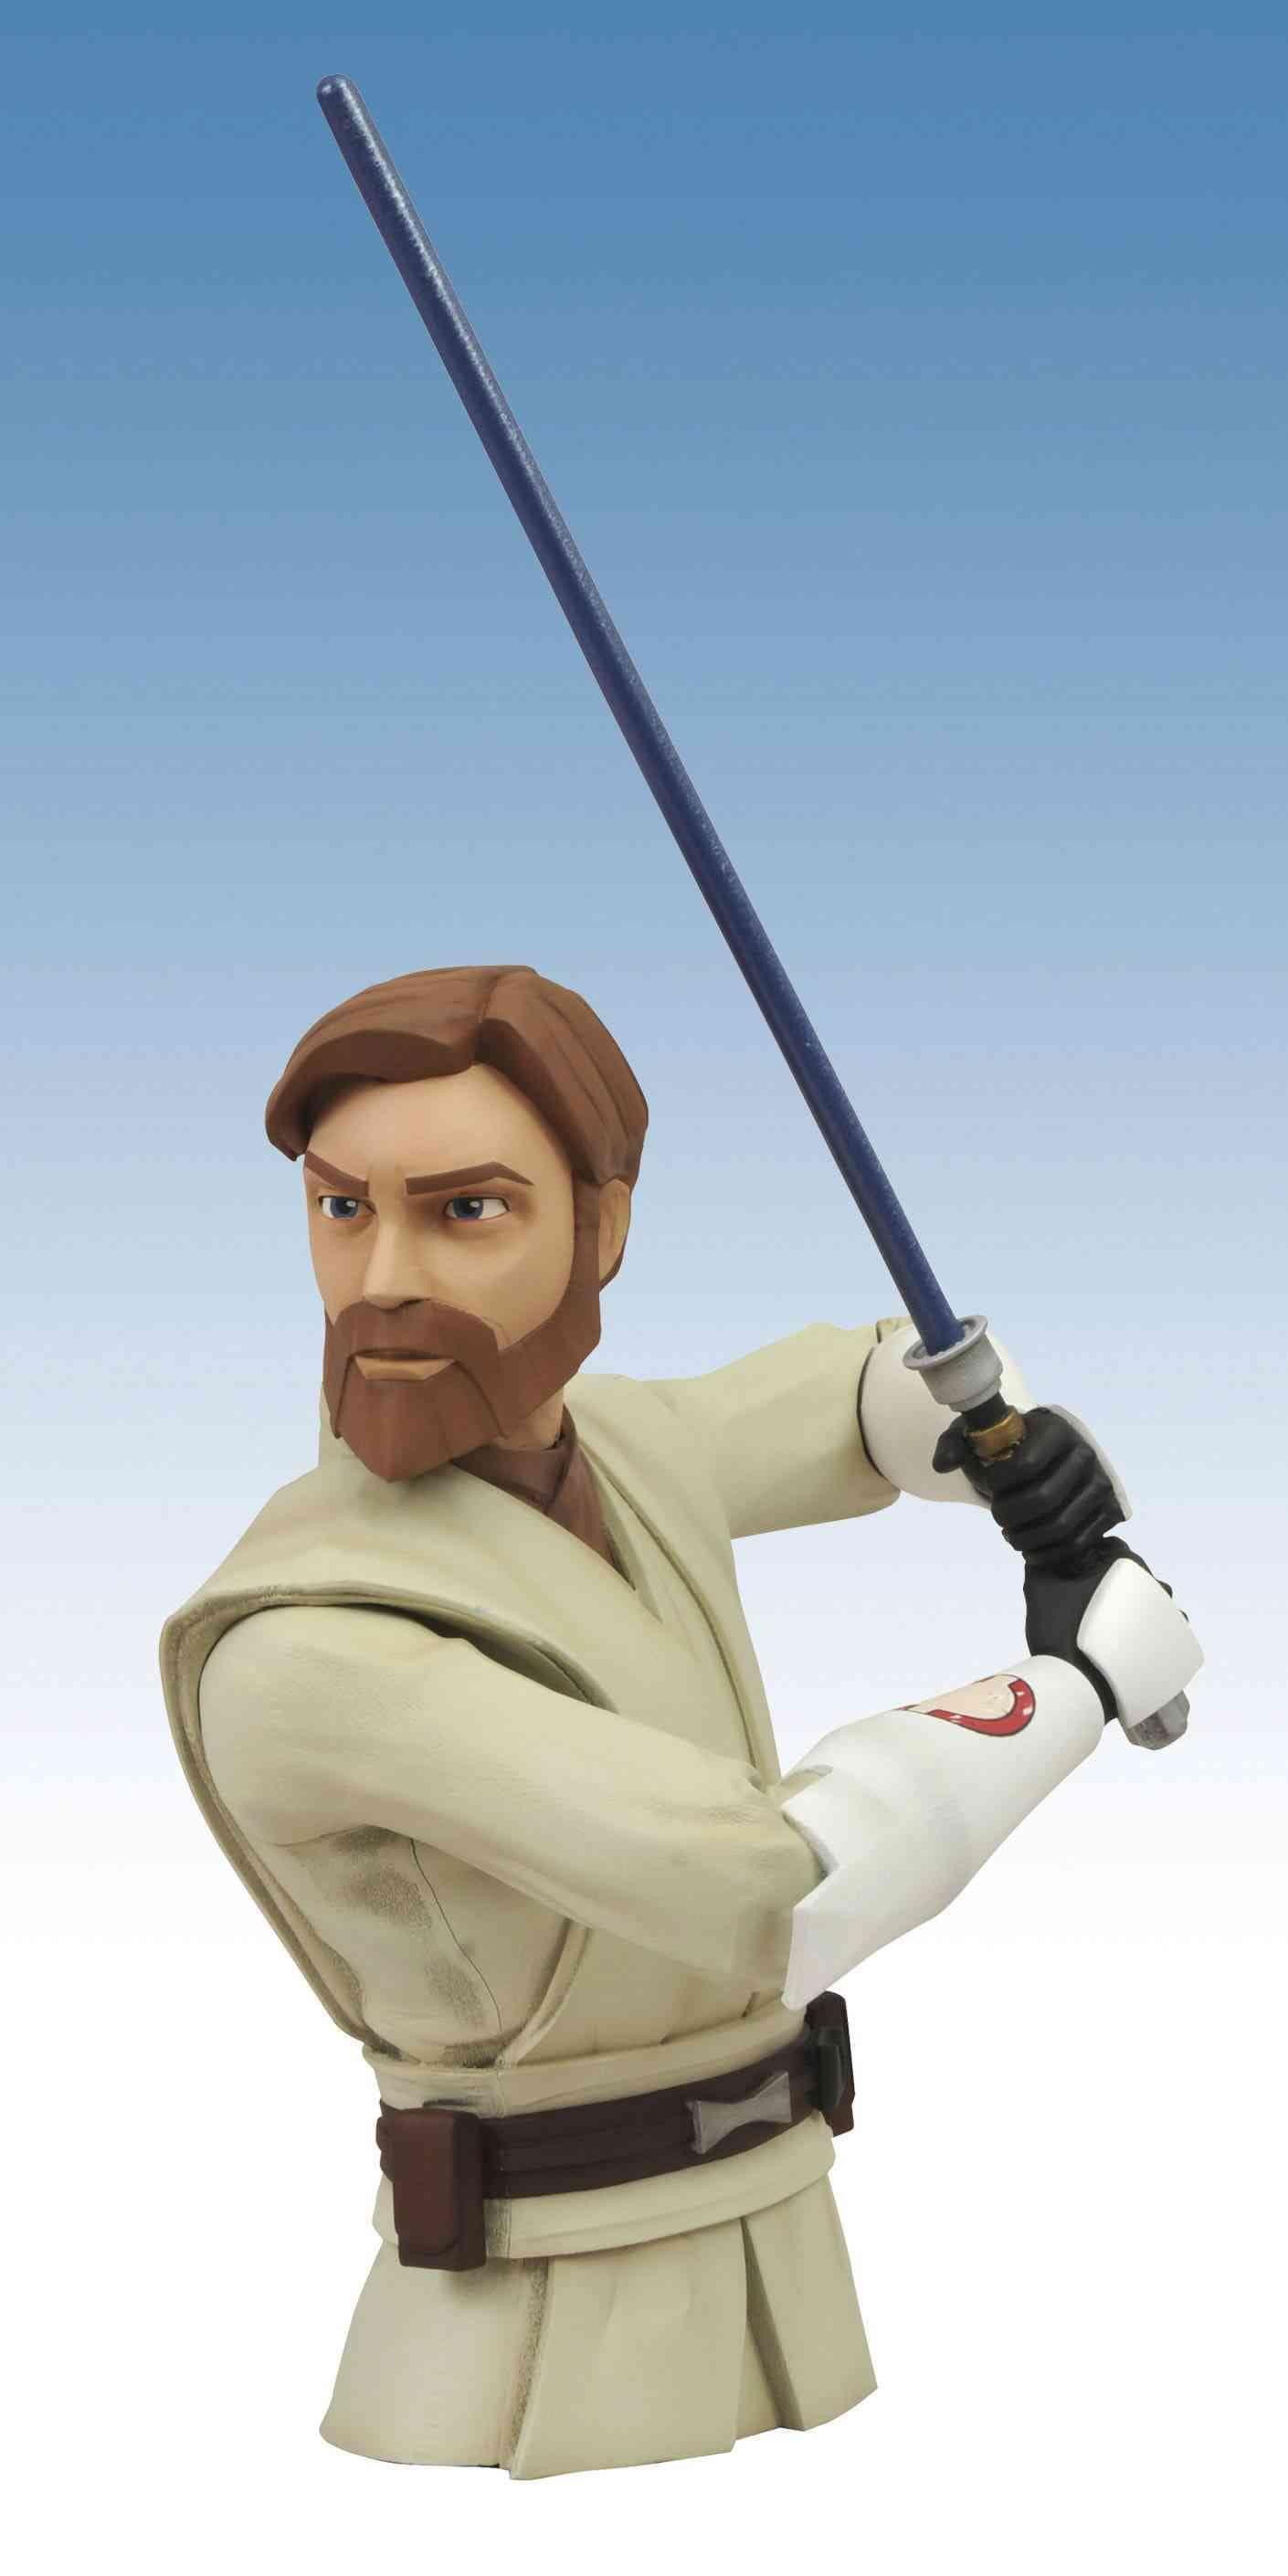 Star Wars Clone Wars Obi-Wan Bank (Toy)